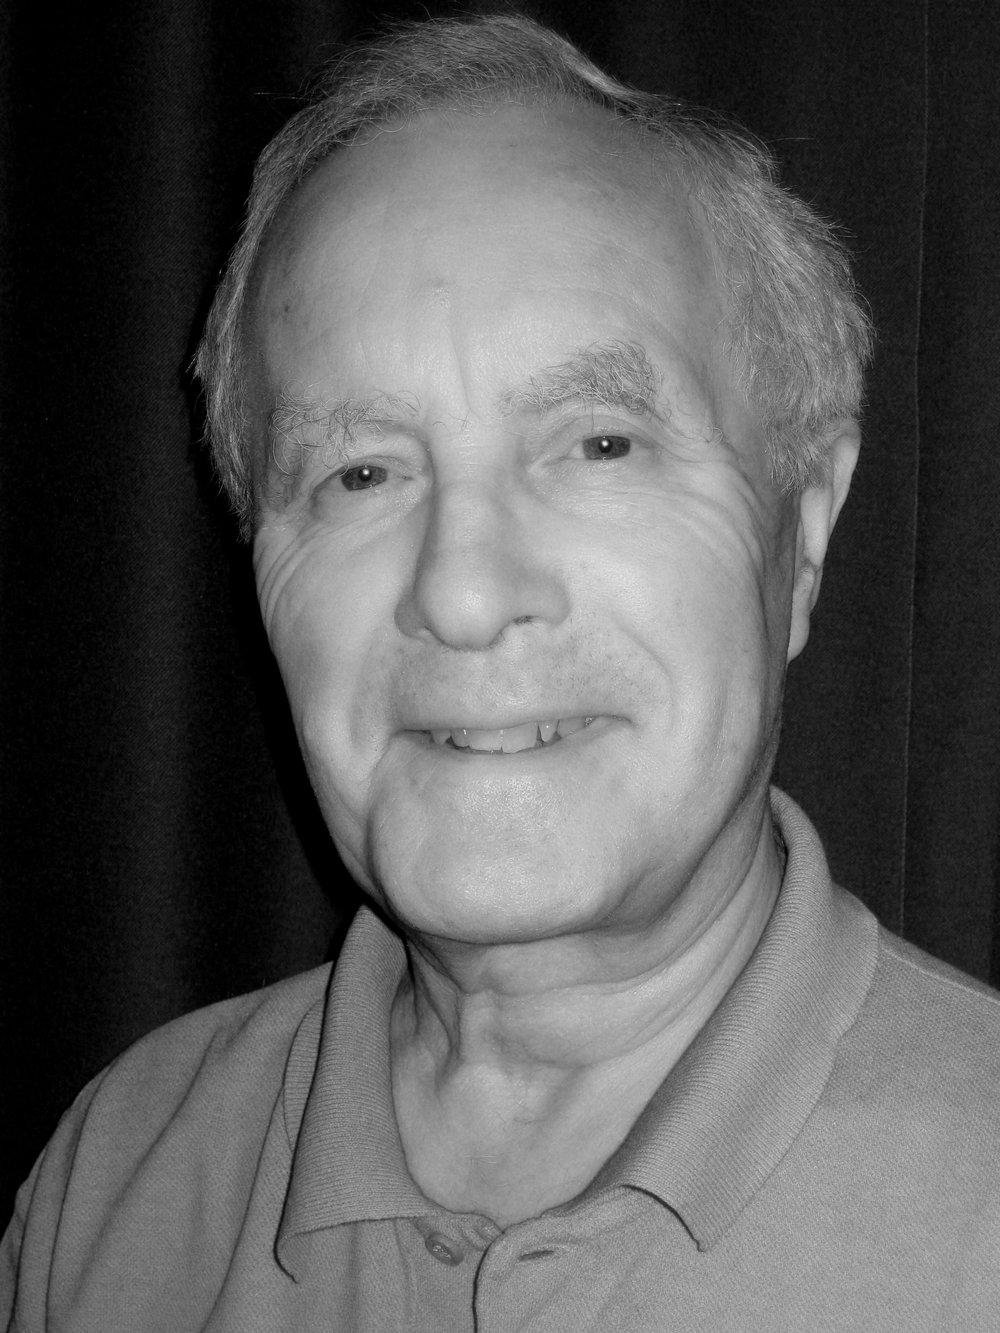 Brian Howe - The Burgomaster